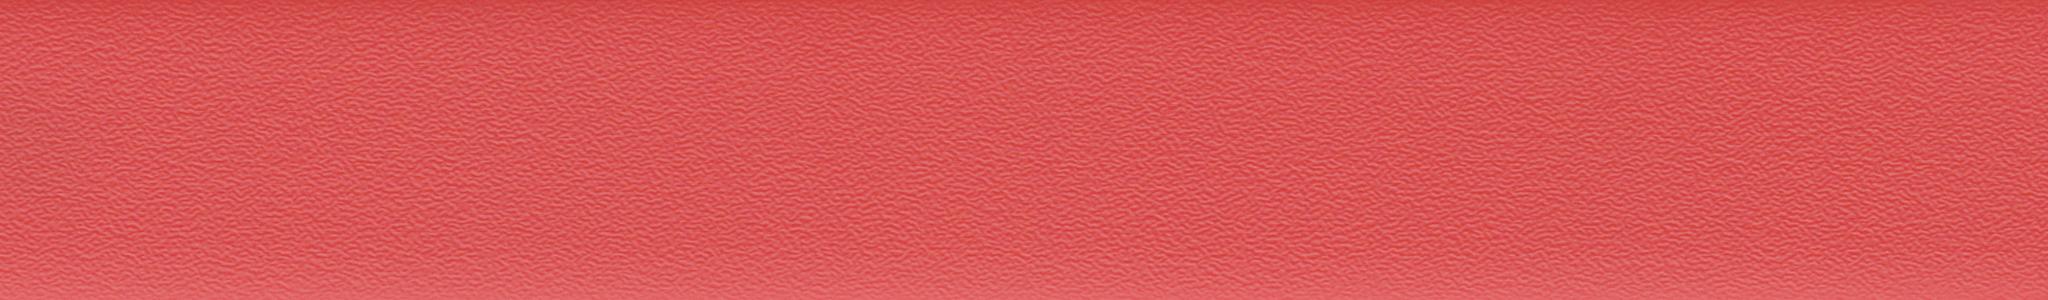 HU 13000 кромка ABS красная жемчуг 101